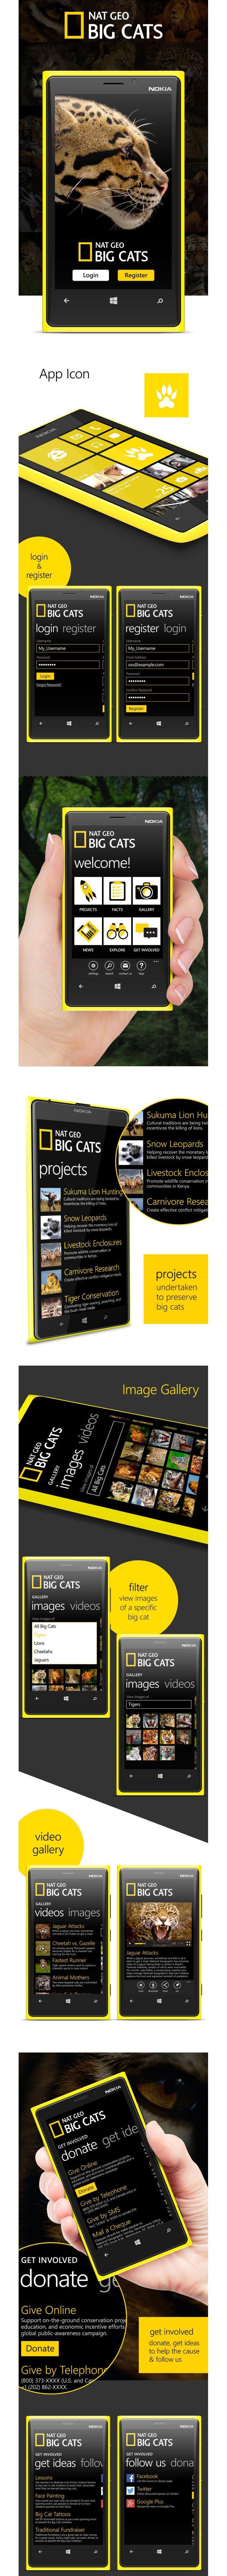 National Geographic Big Cats – Windows App